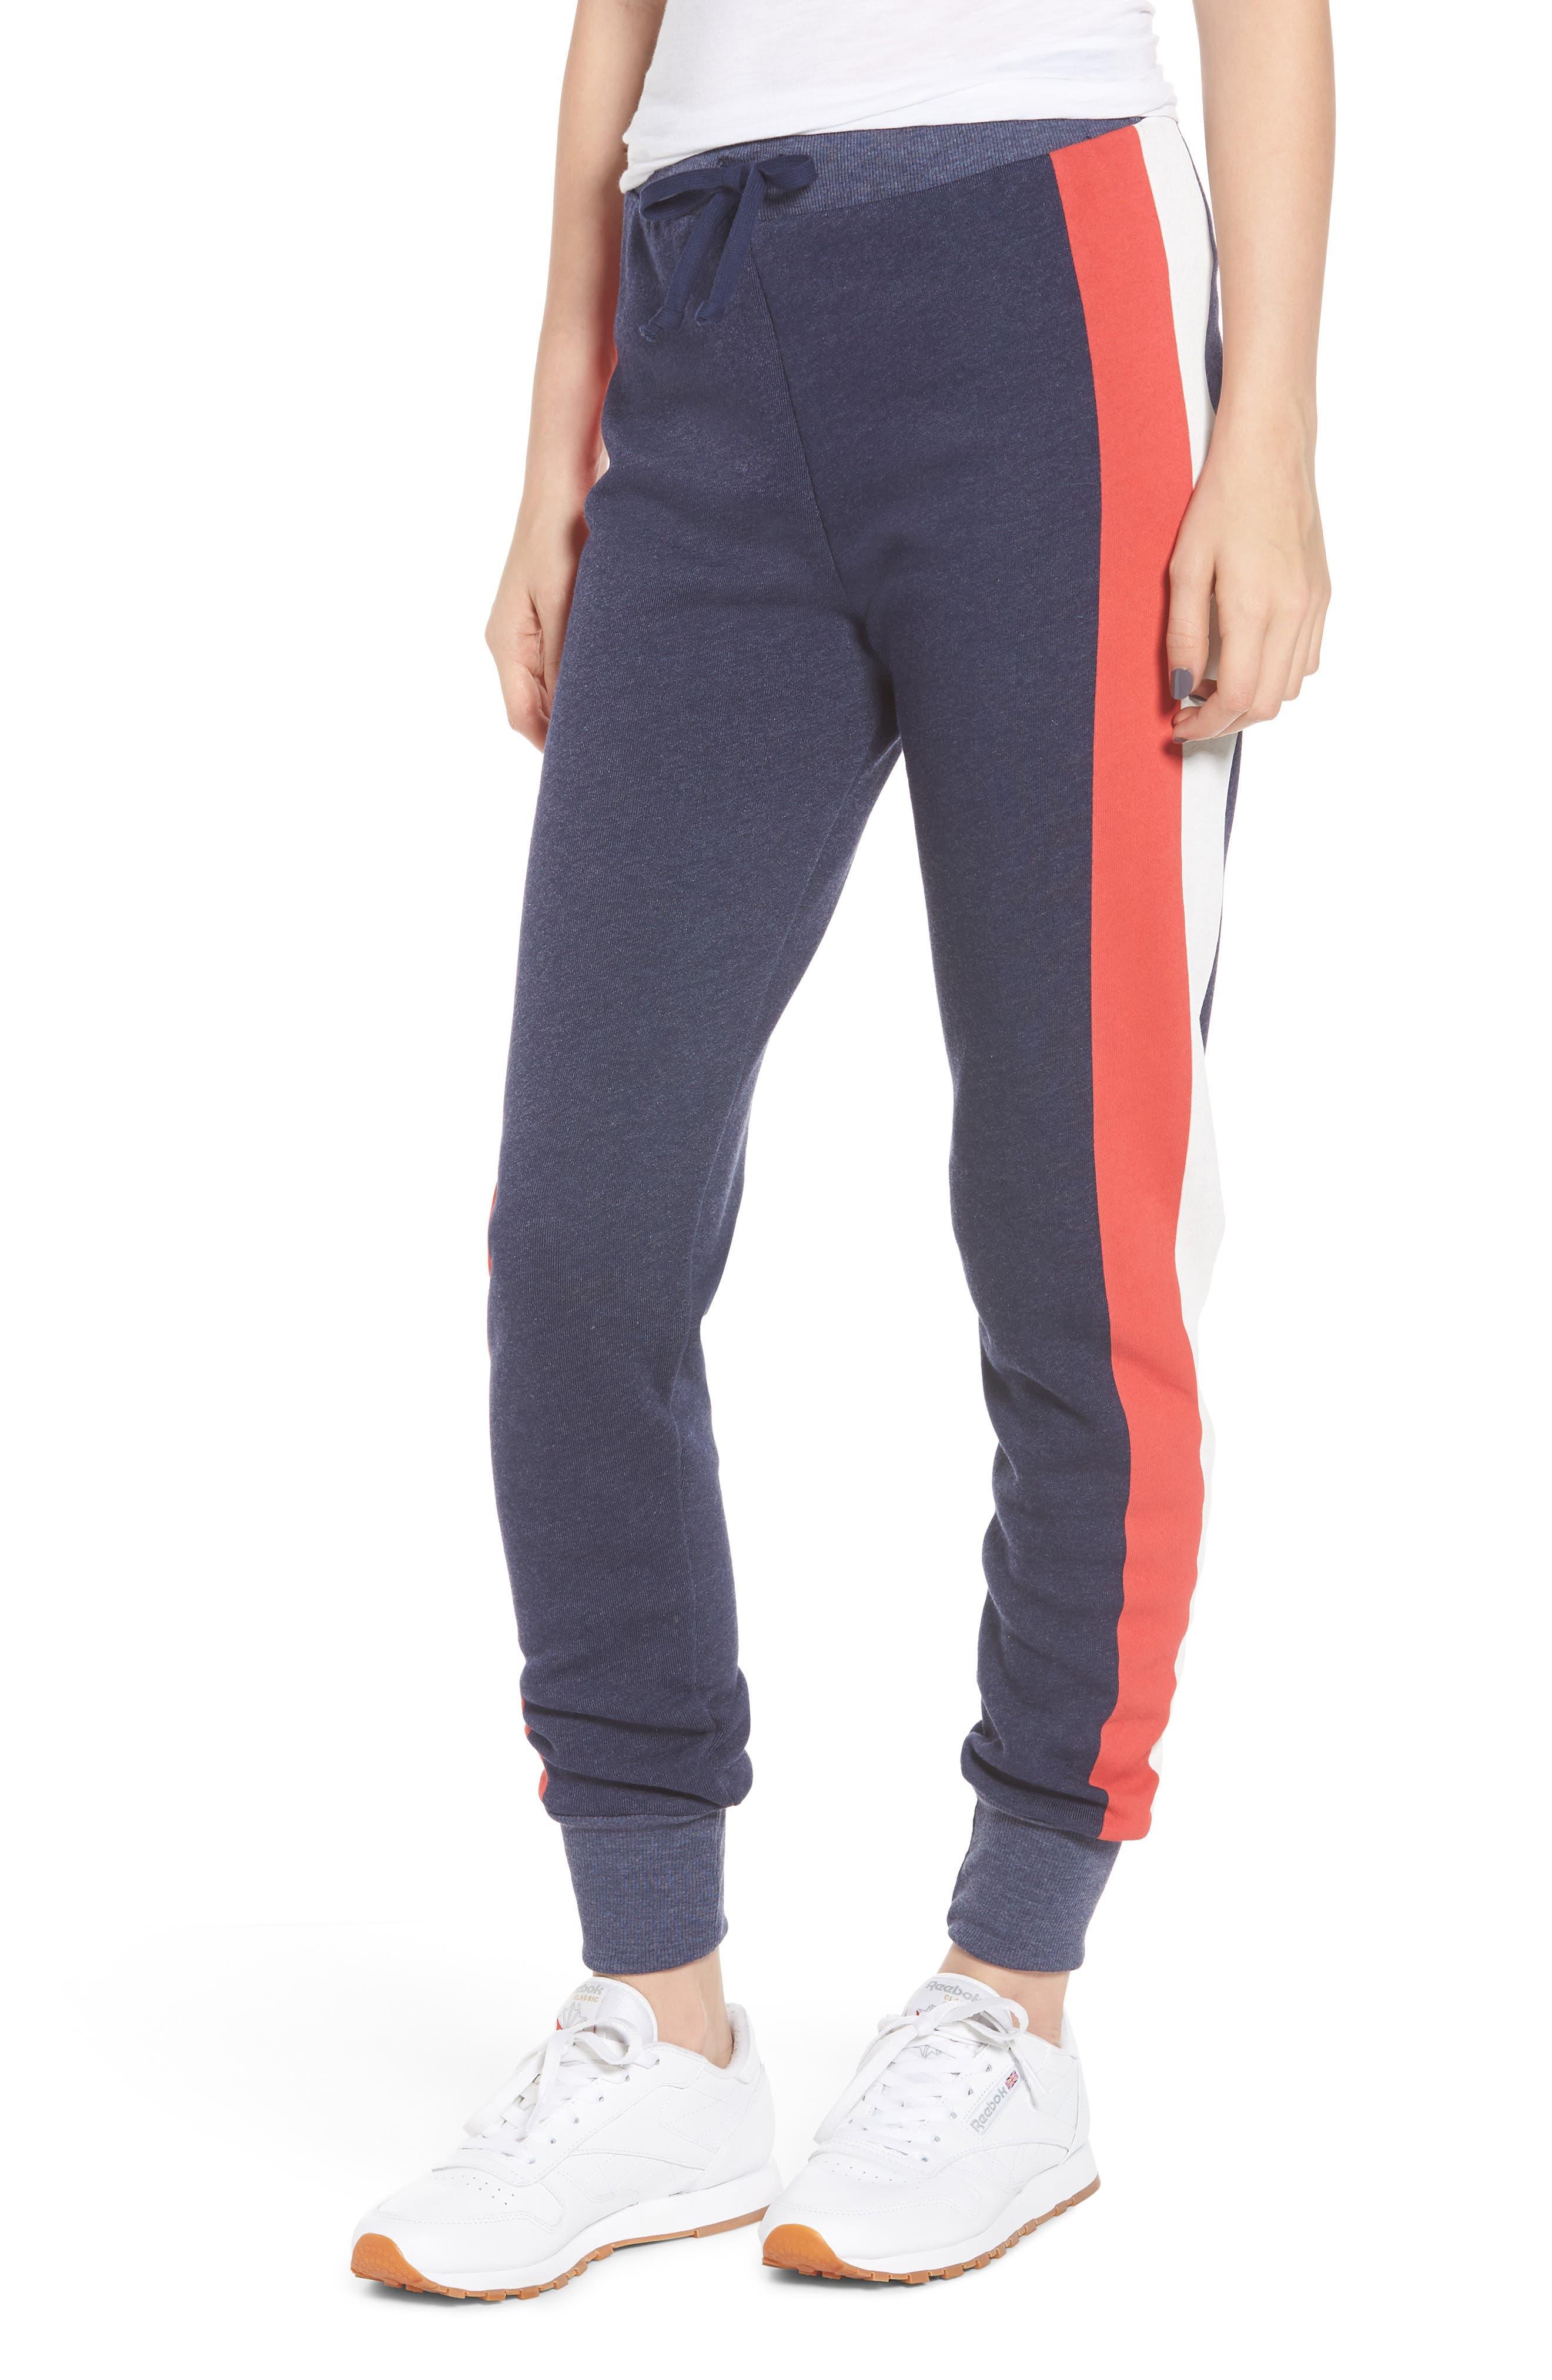 Jack Jogger Side-Stripe Trousers in Oxford